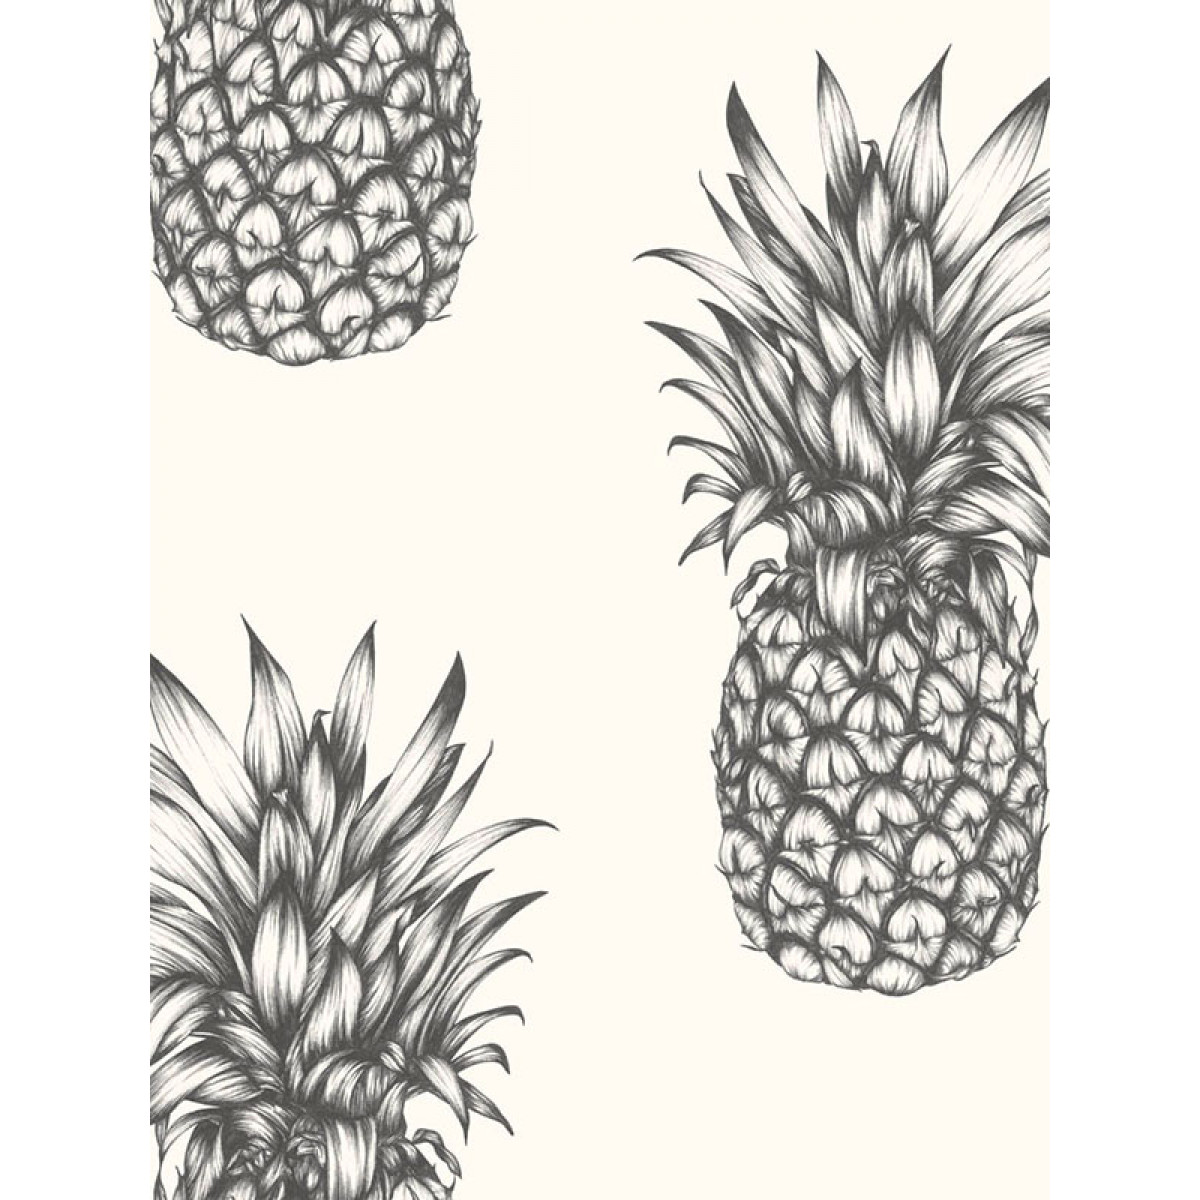 Tropics Copacabana Pineapple Wallpaper  Black  White